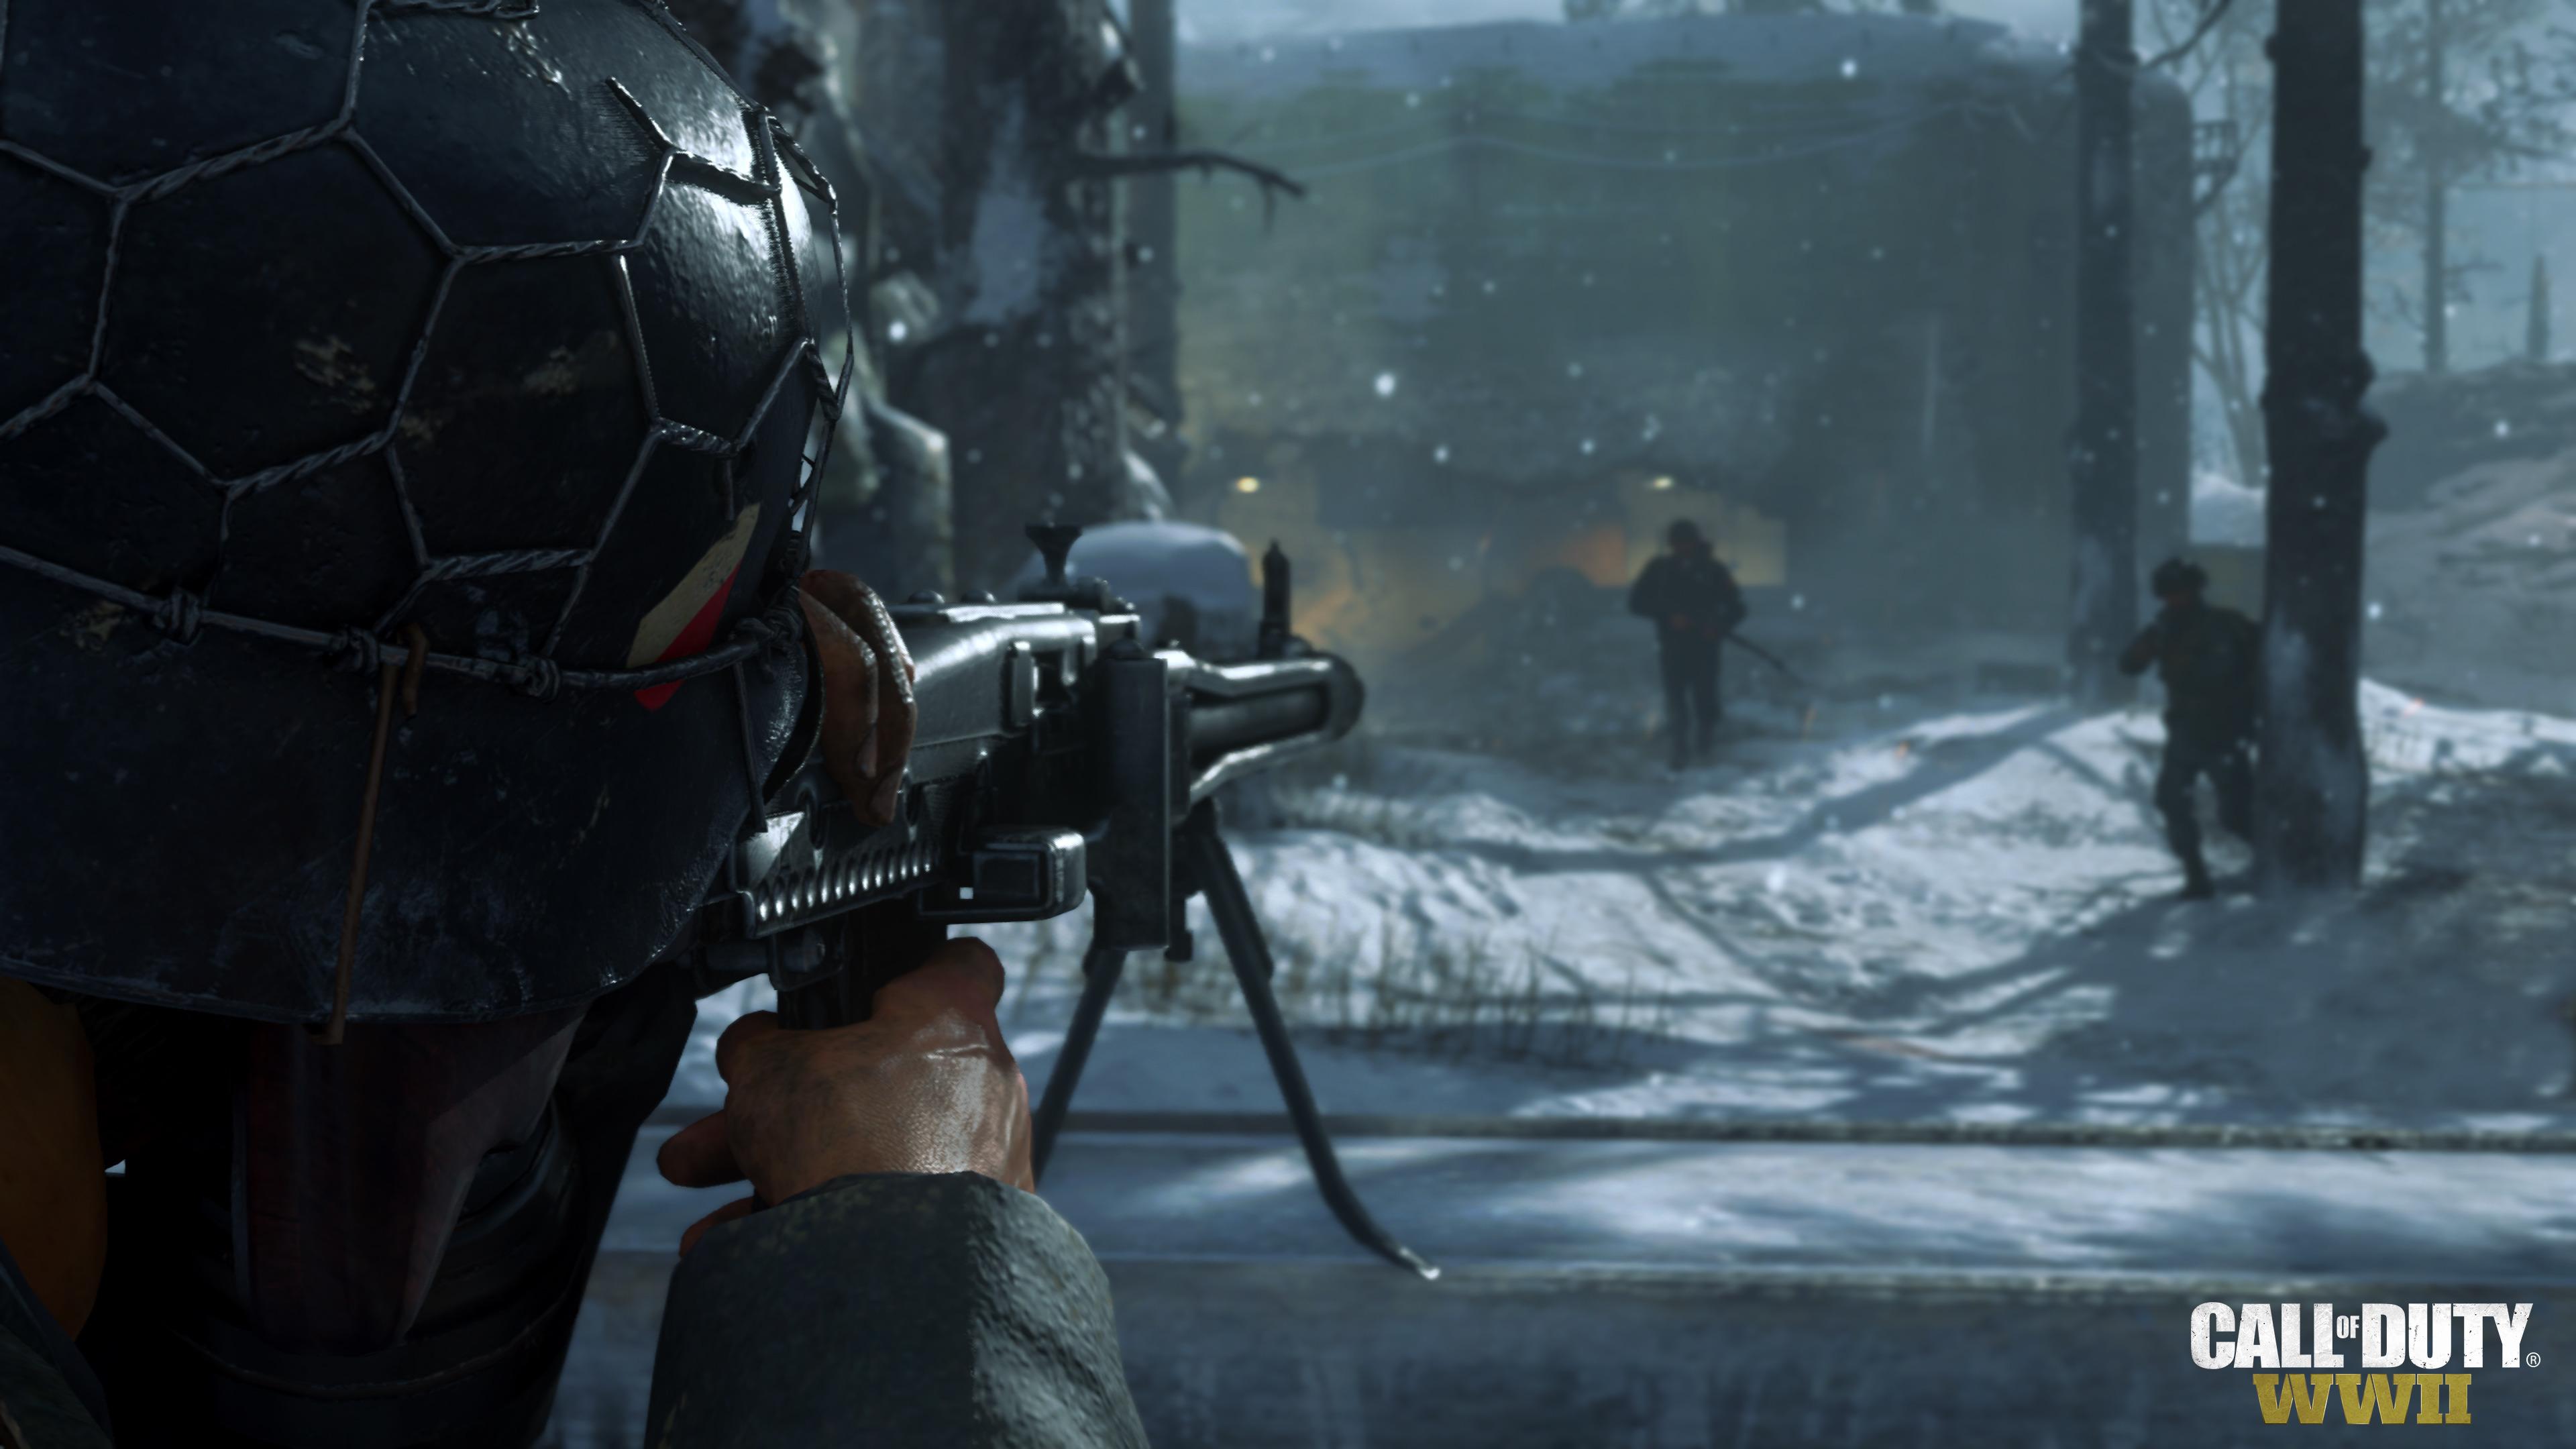 Call Of Duty Ps4wallpaperscom